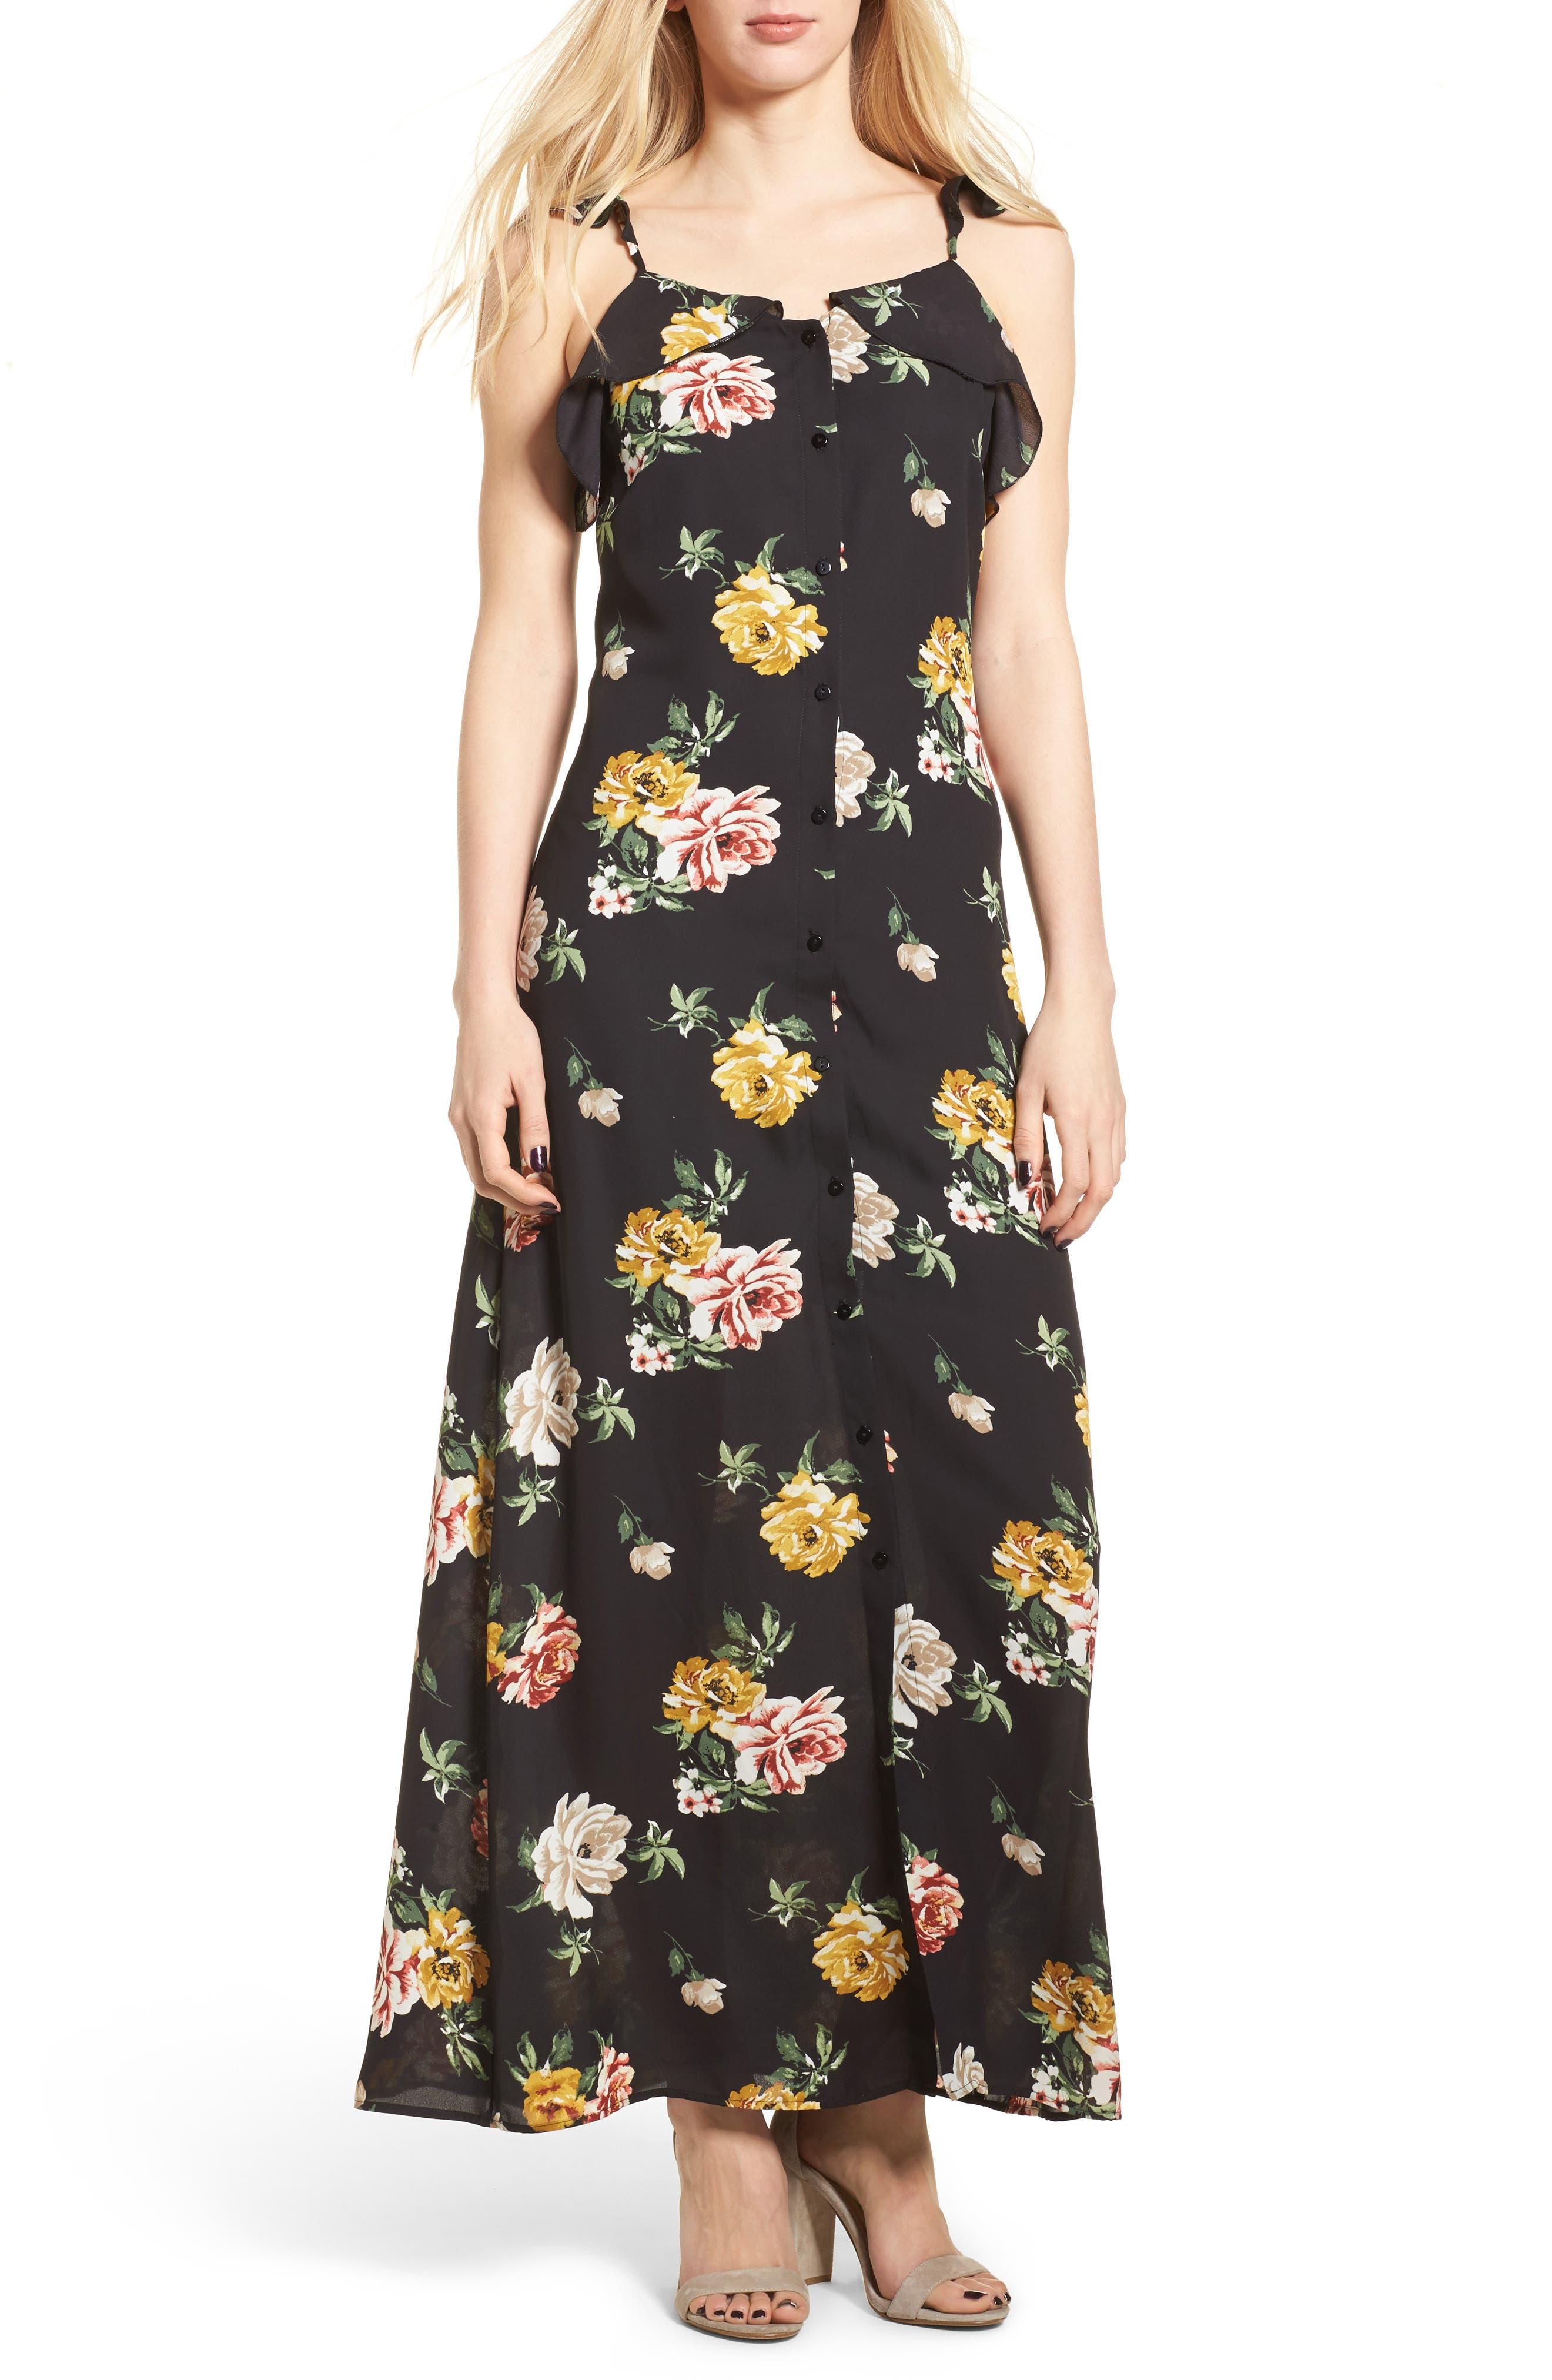 Simple Floral Dresses for Women